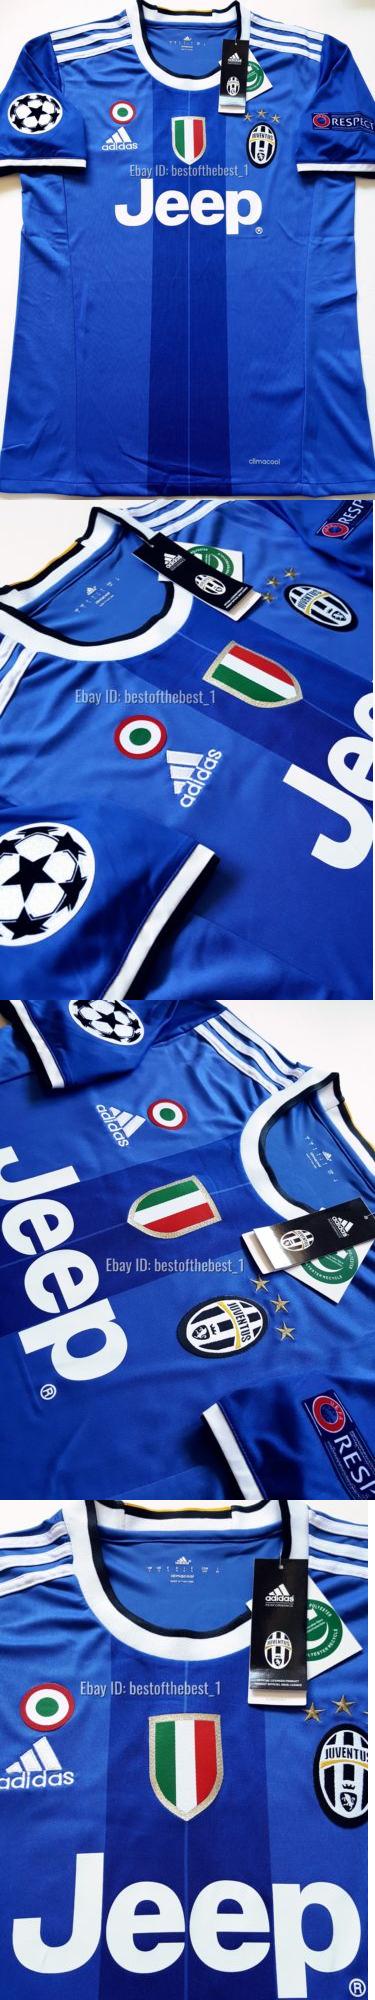 ... NWT Soccer-International Clubs 2887 2016 2017 Juventus Champions League  Paulo Dybala Away Jersey Blue . 491efe50a